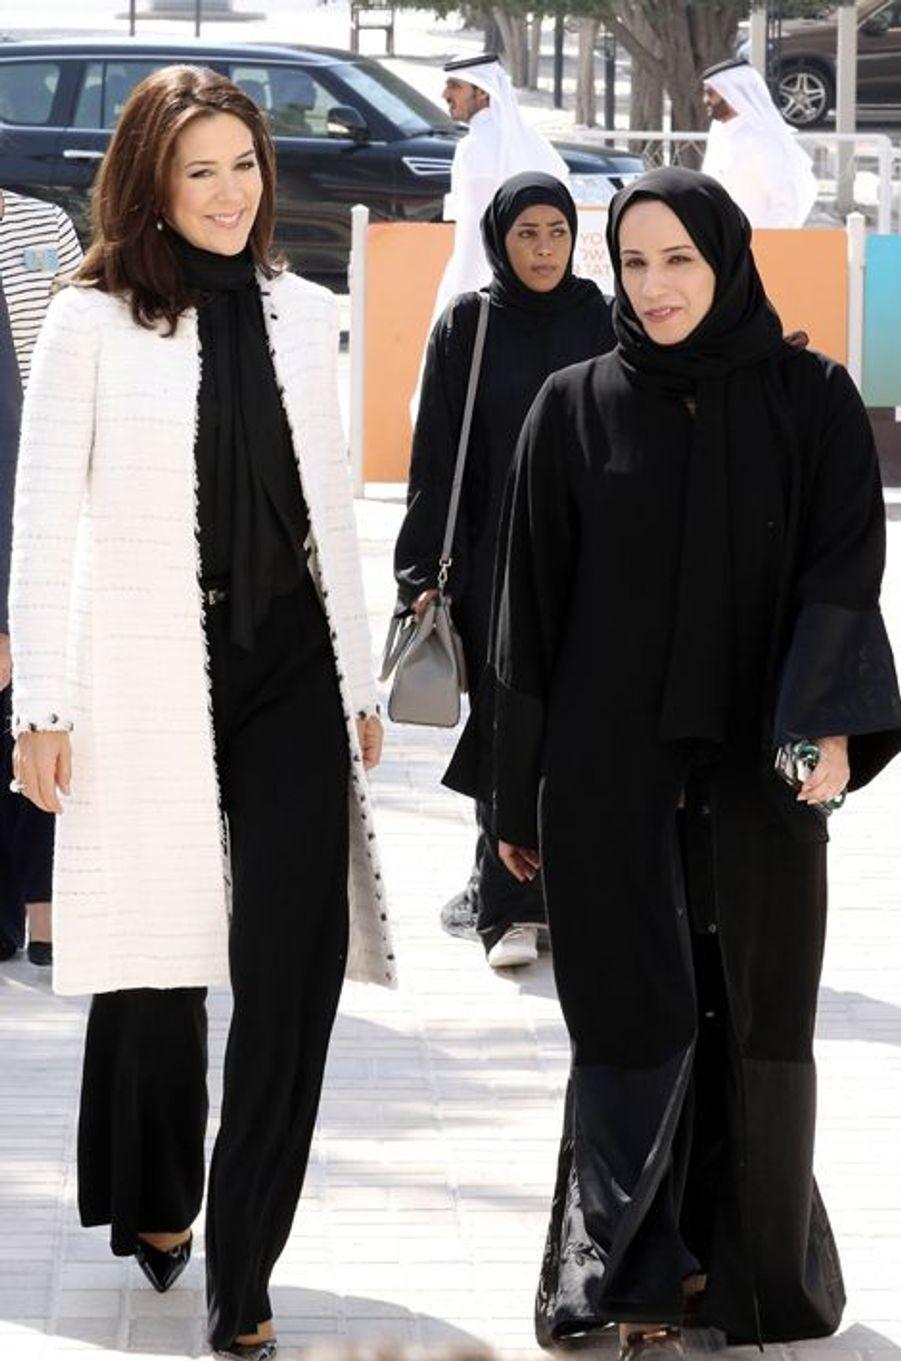 La princesse Mary de Danemark à Doha, le 3 mars 2016